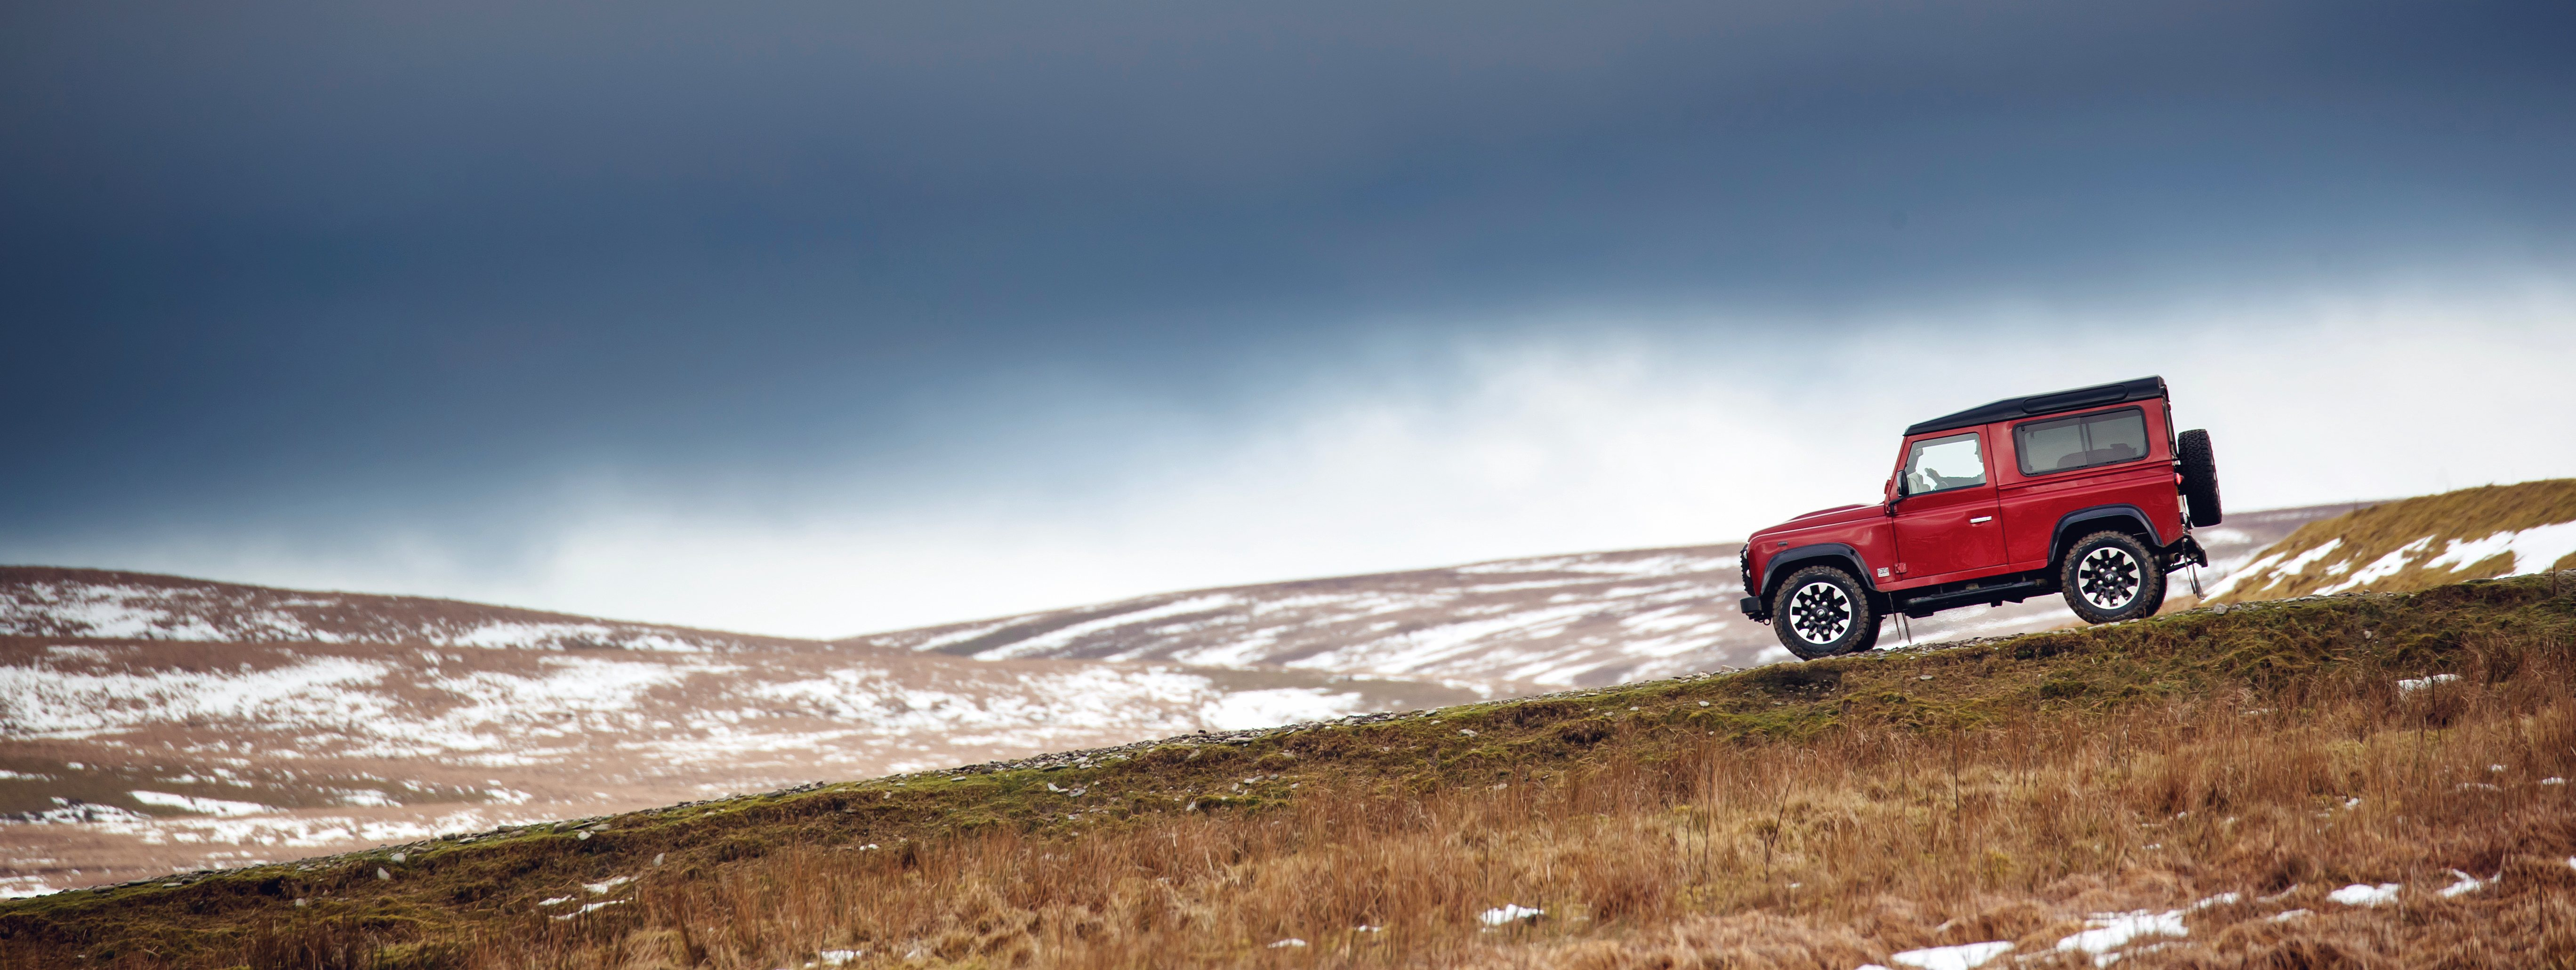 Comeback für den Defender! Land Rover präsentiert V8 Sonderedition